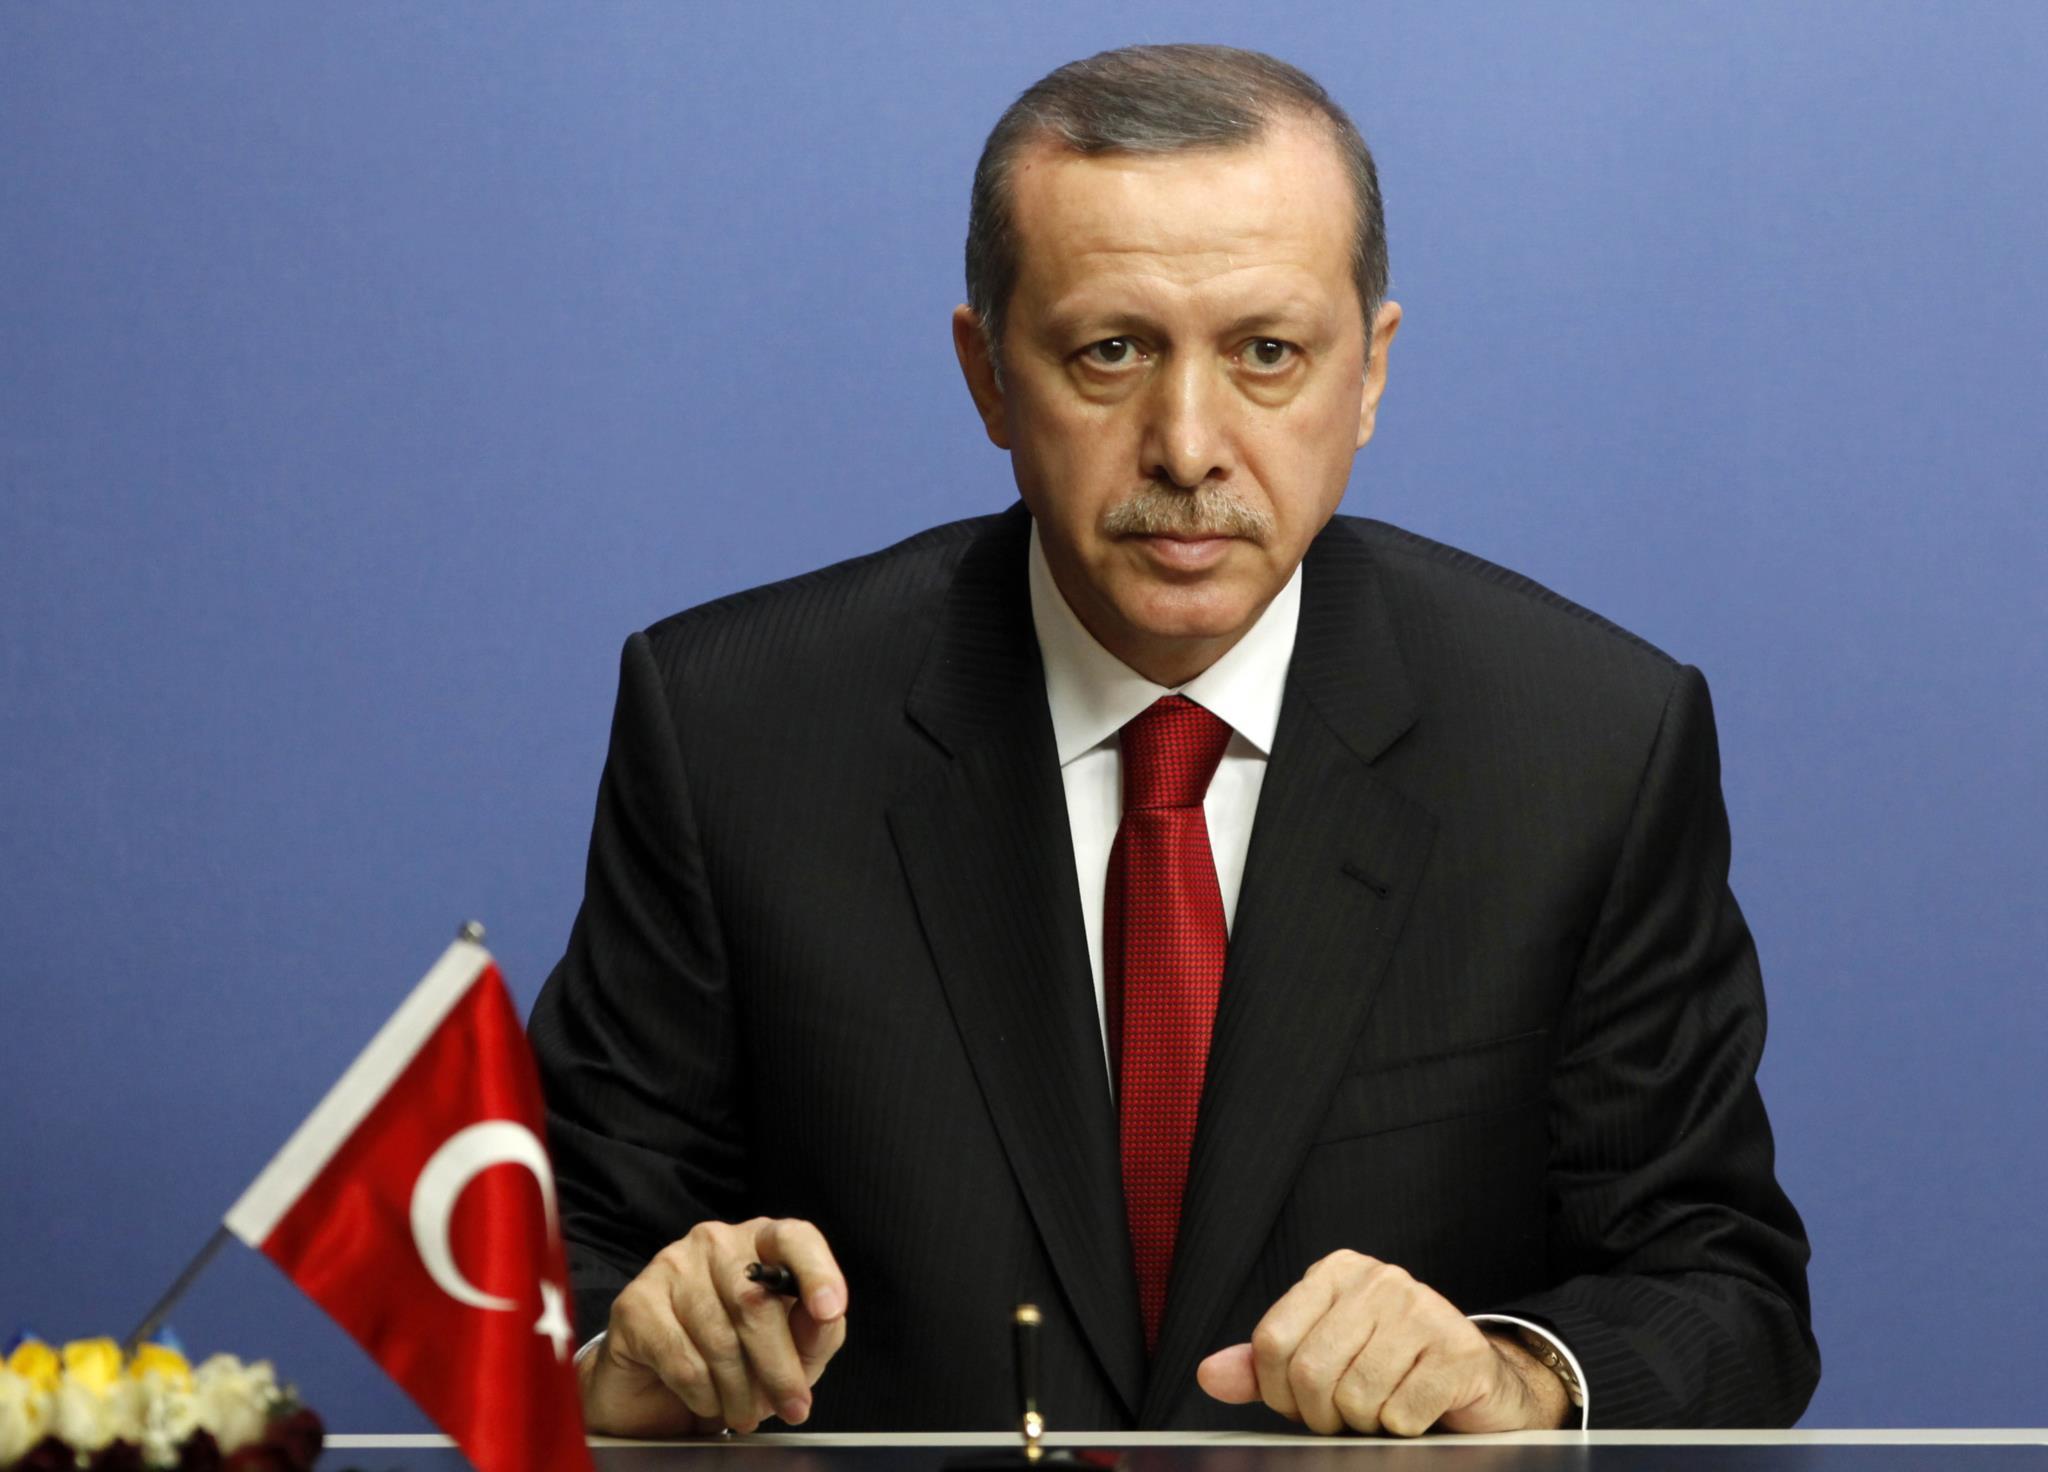 PÚBLICO - Golpe na Turquia: 136 diplomatas ou familiares pedem asilo na Alemanha